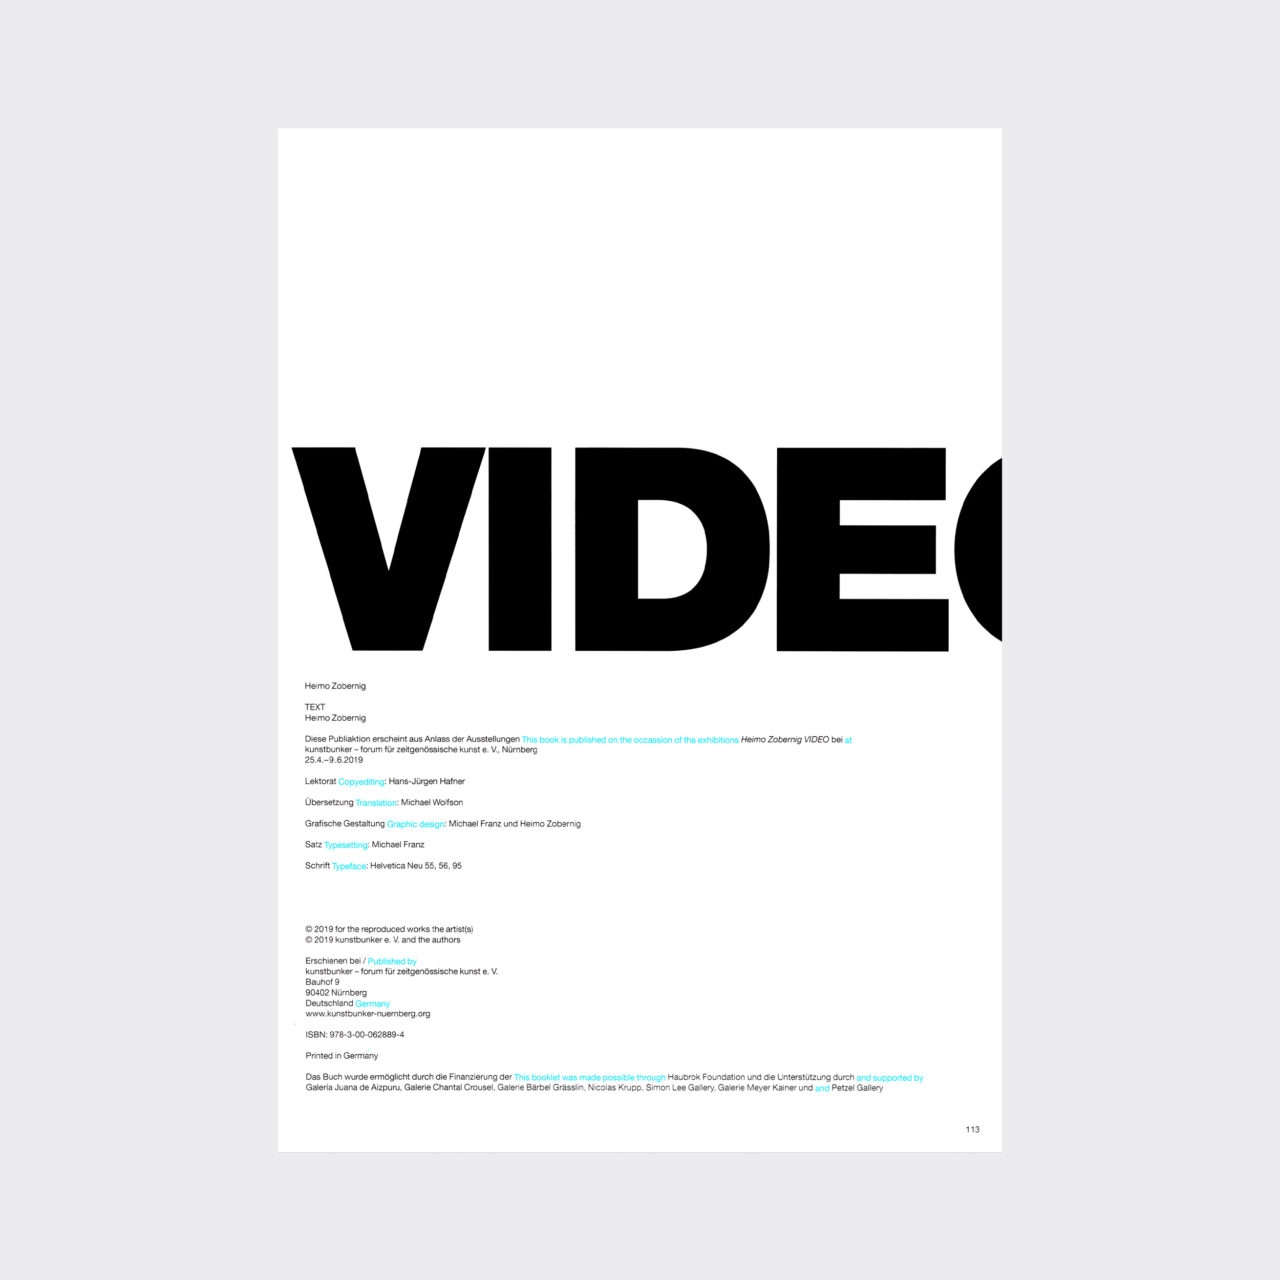 Heimo Zobernig, Video (publication kunstbunker Nuremberg) (2019)